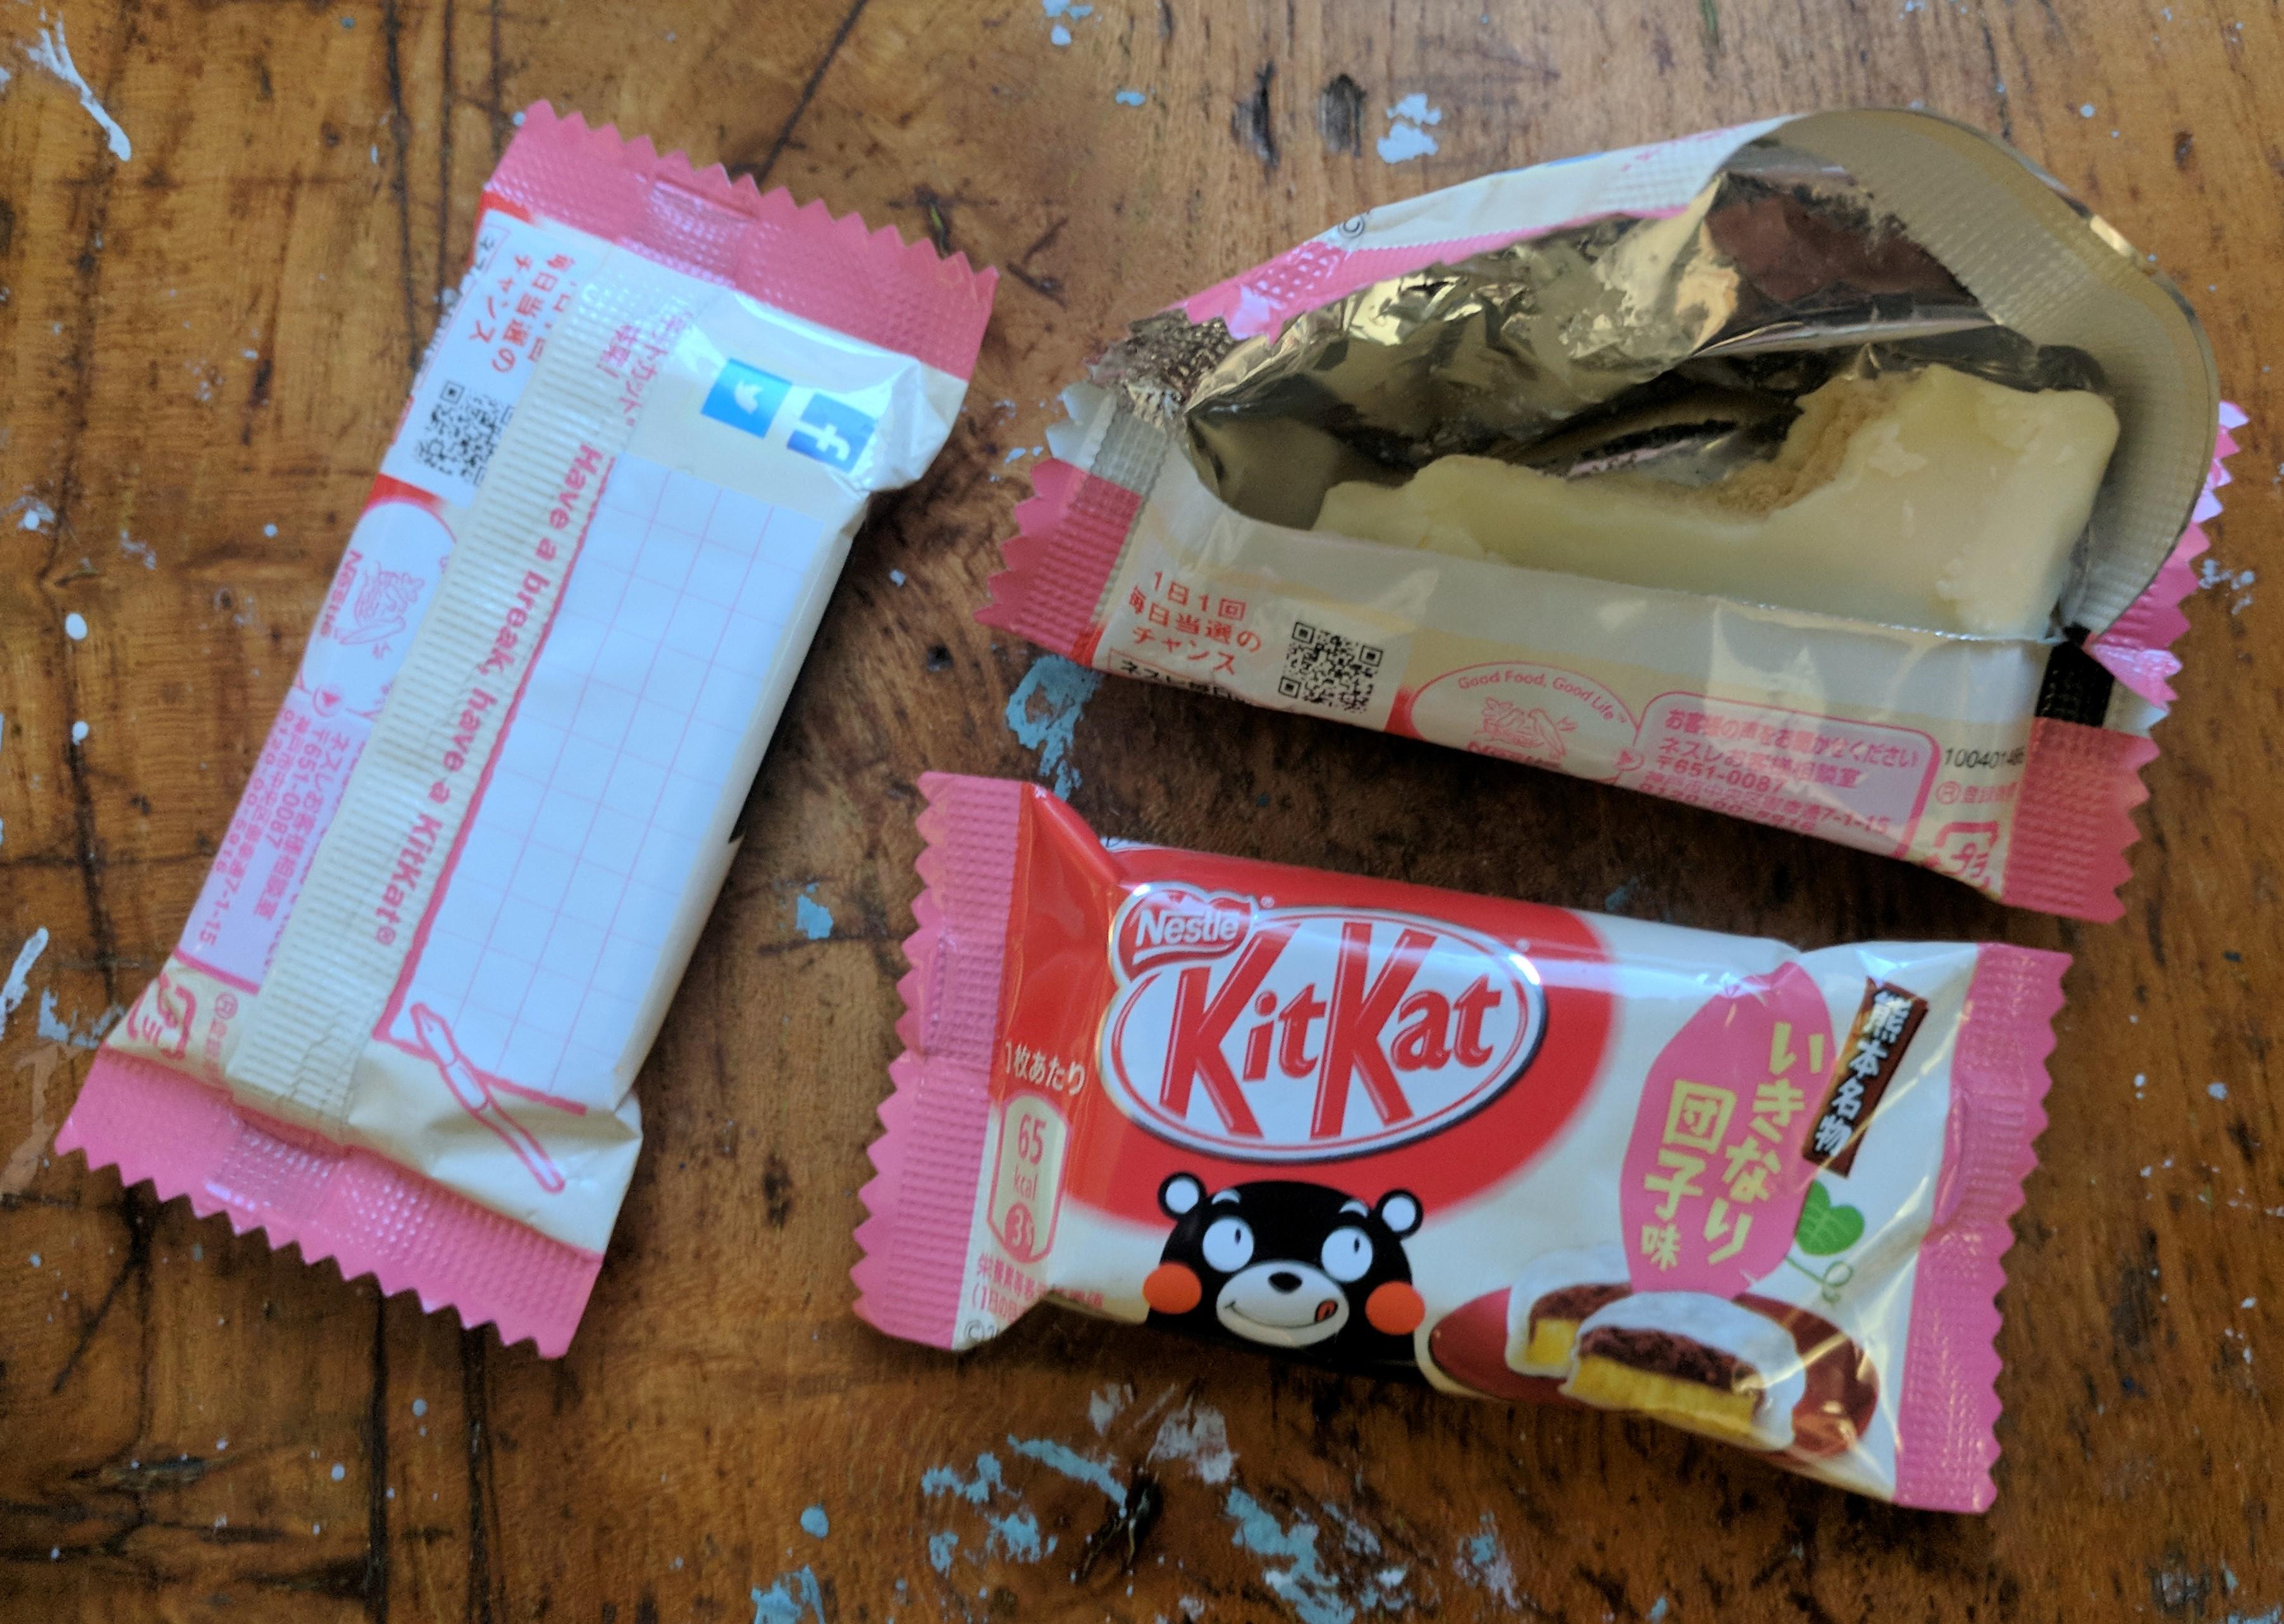 Odd Kit Kat